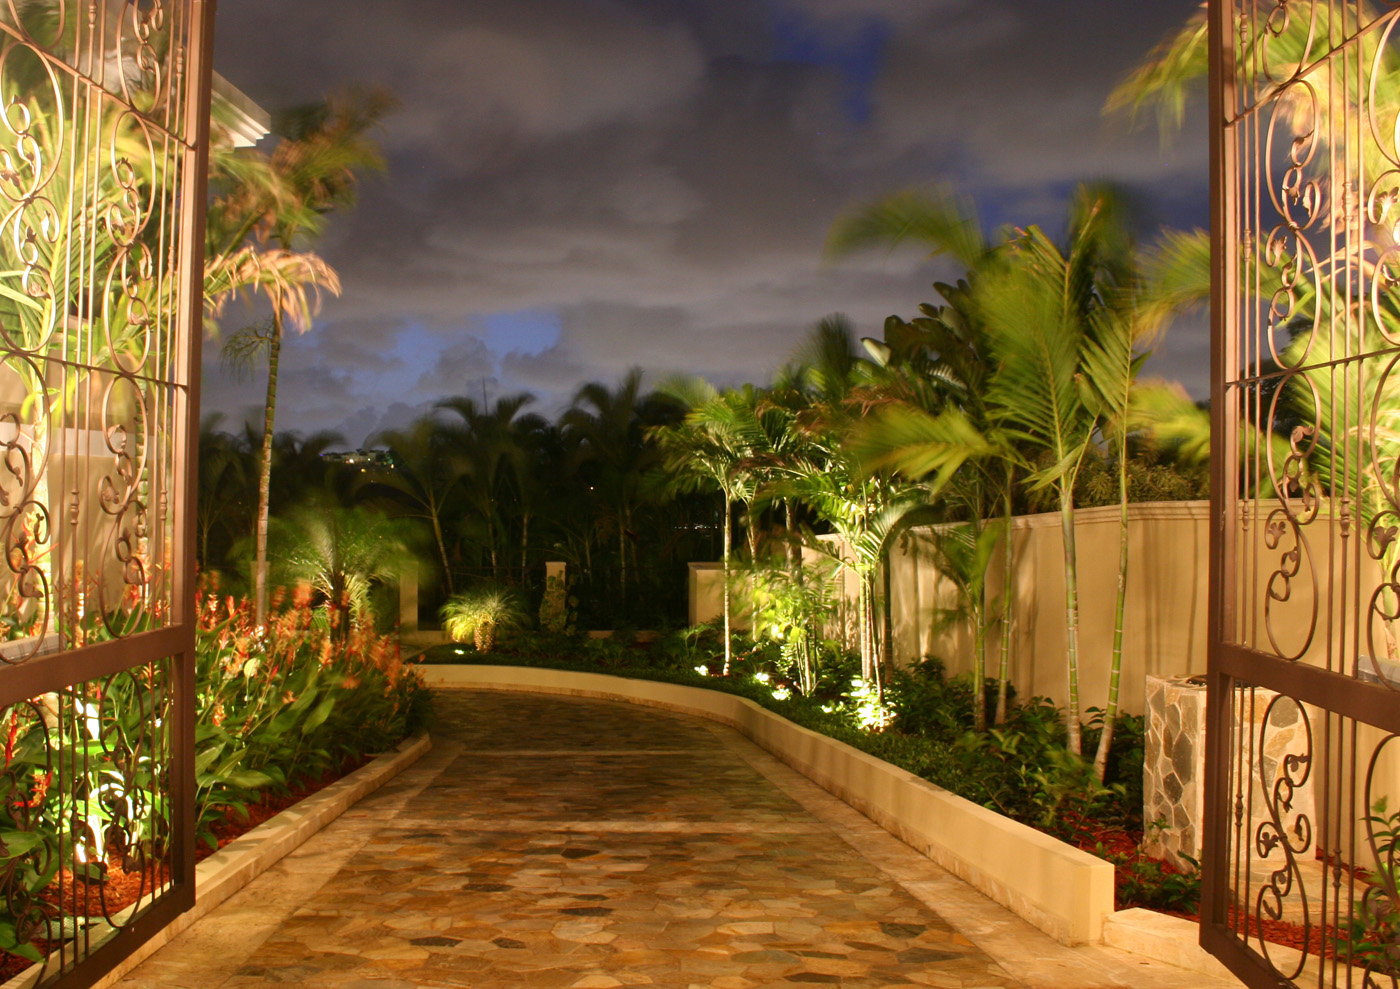 Bonita springs outdoor lighting image gallery bonita springs outdoor lighting for your entry driveway aloadofball Gallery